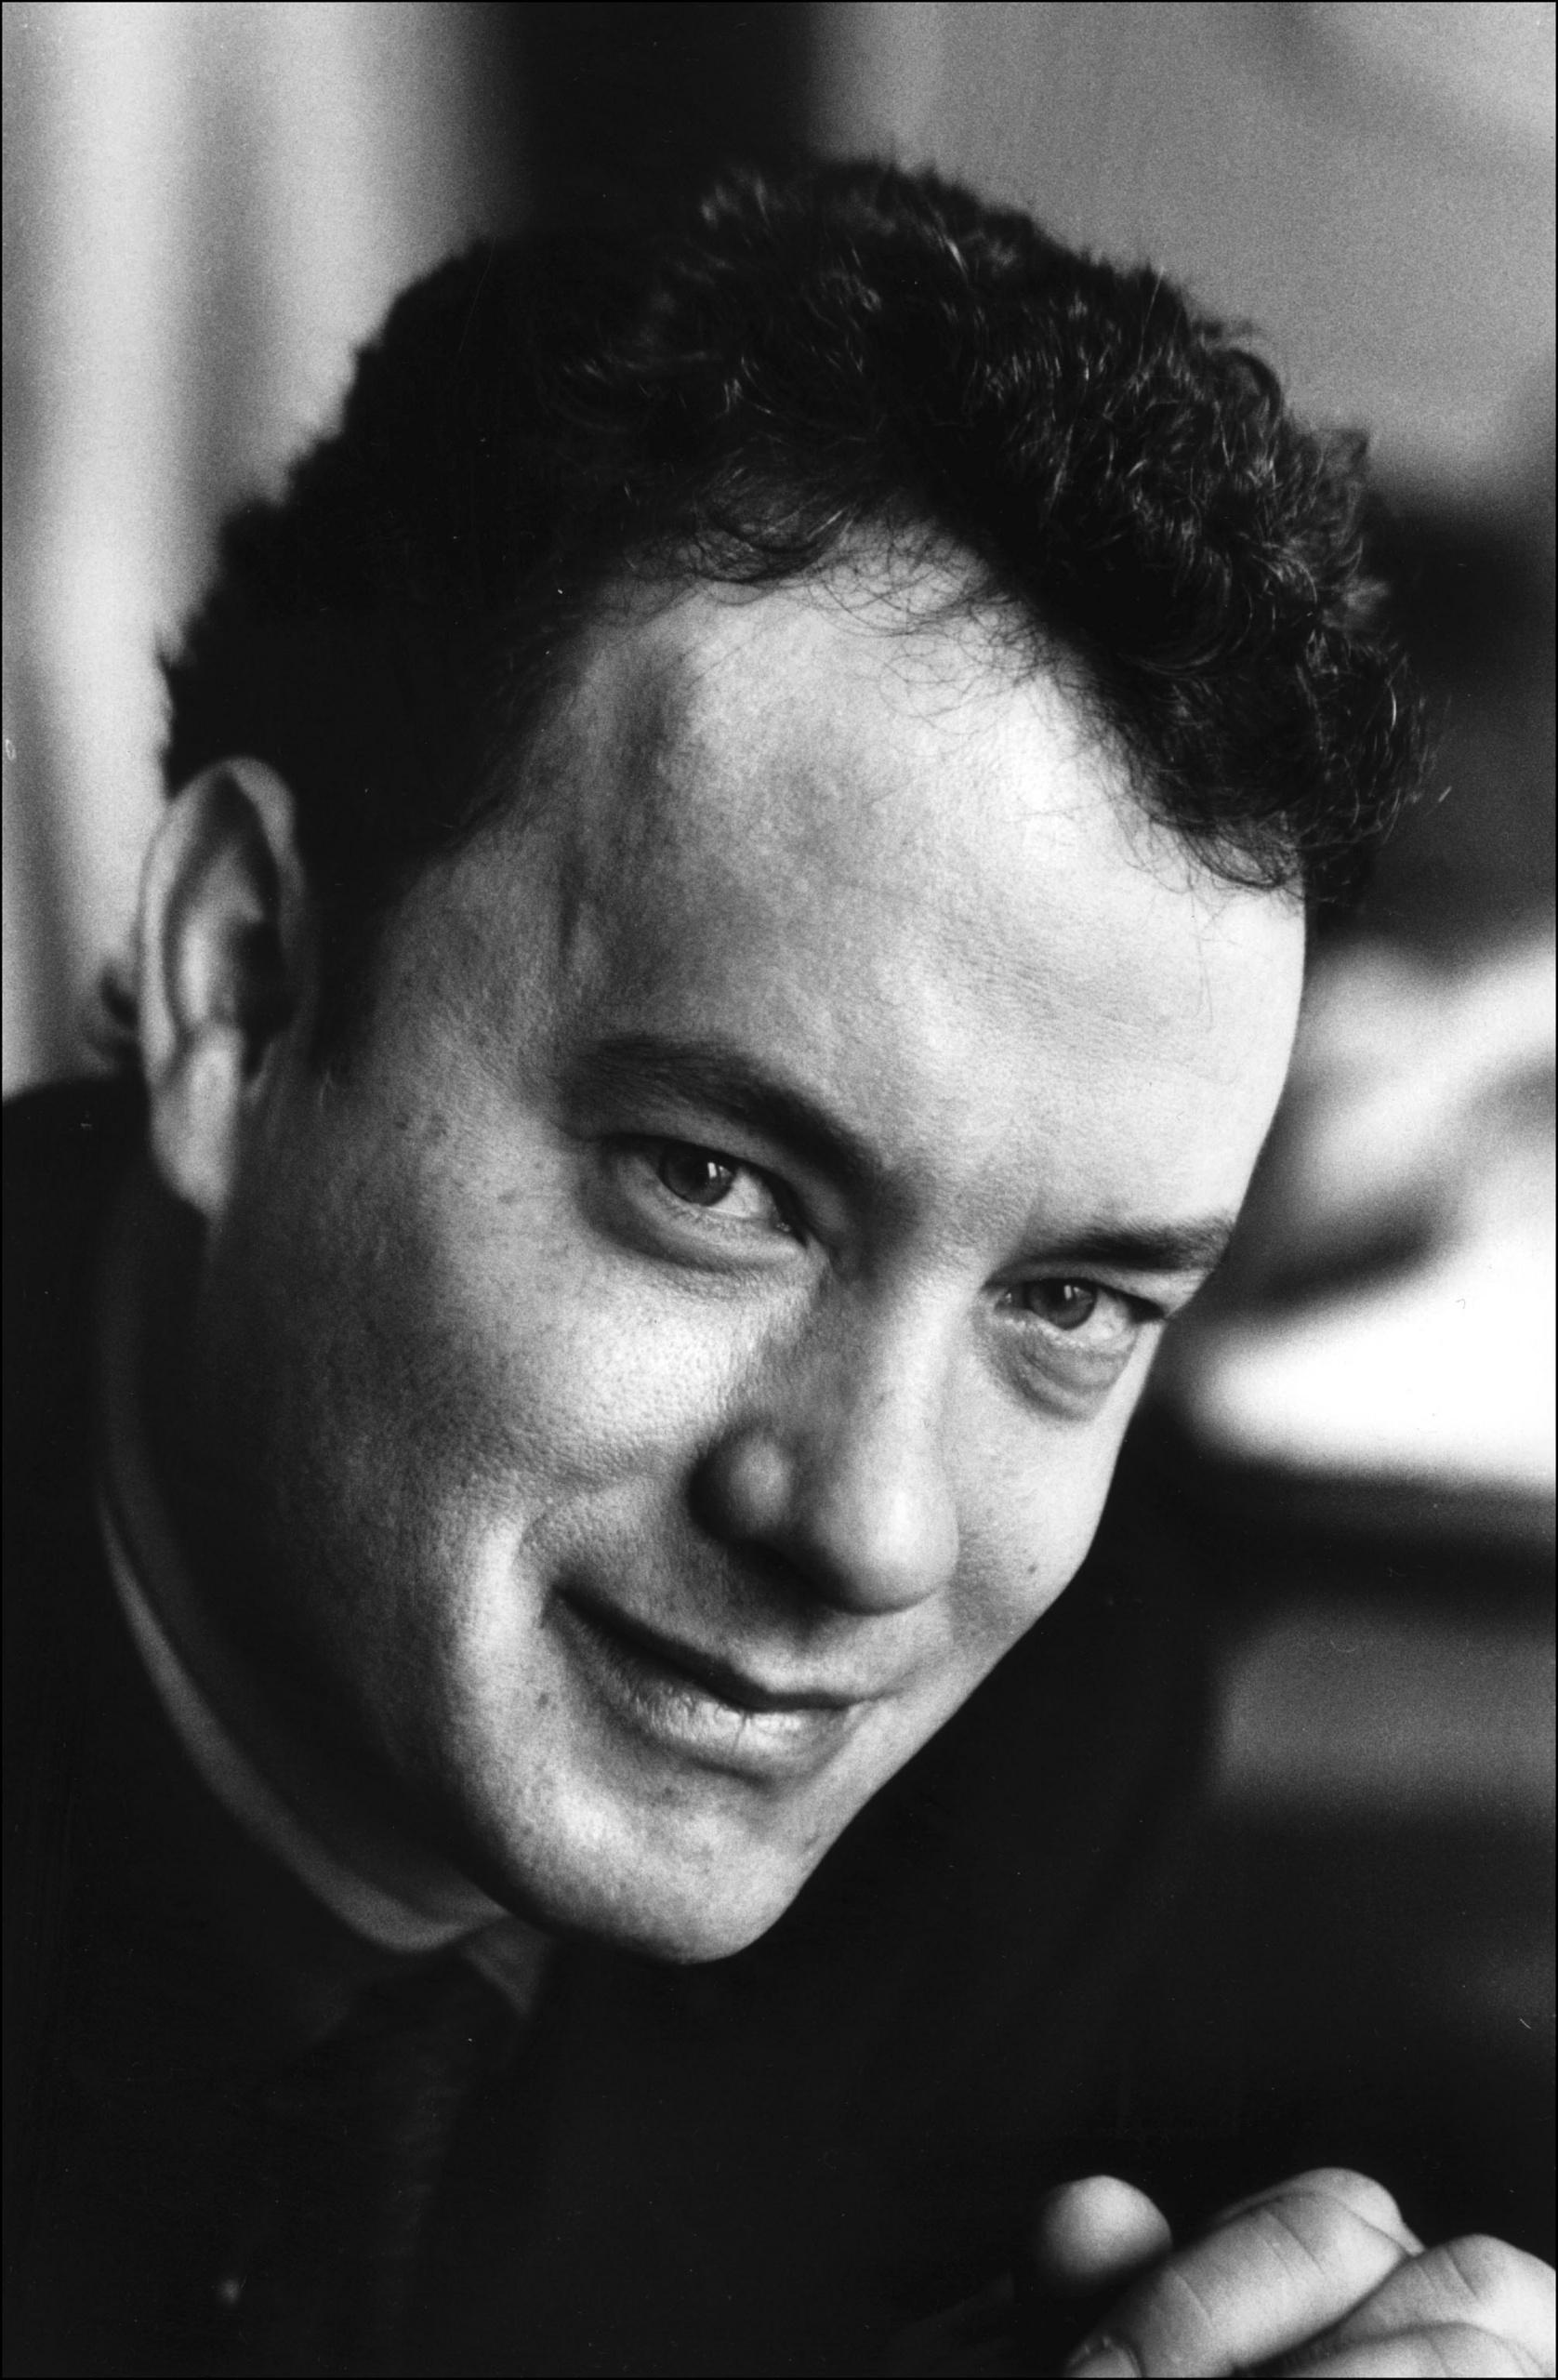 Tom Hanks - Wallpaper Hot